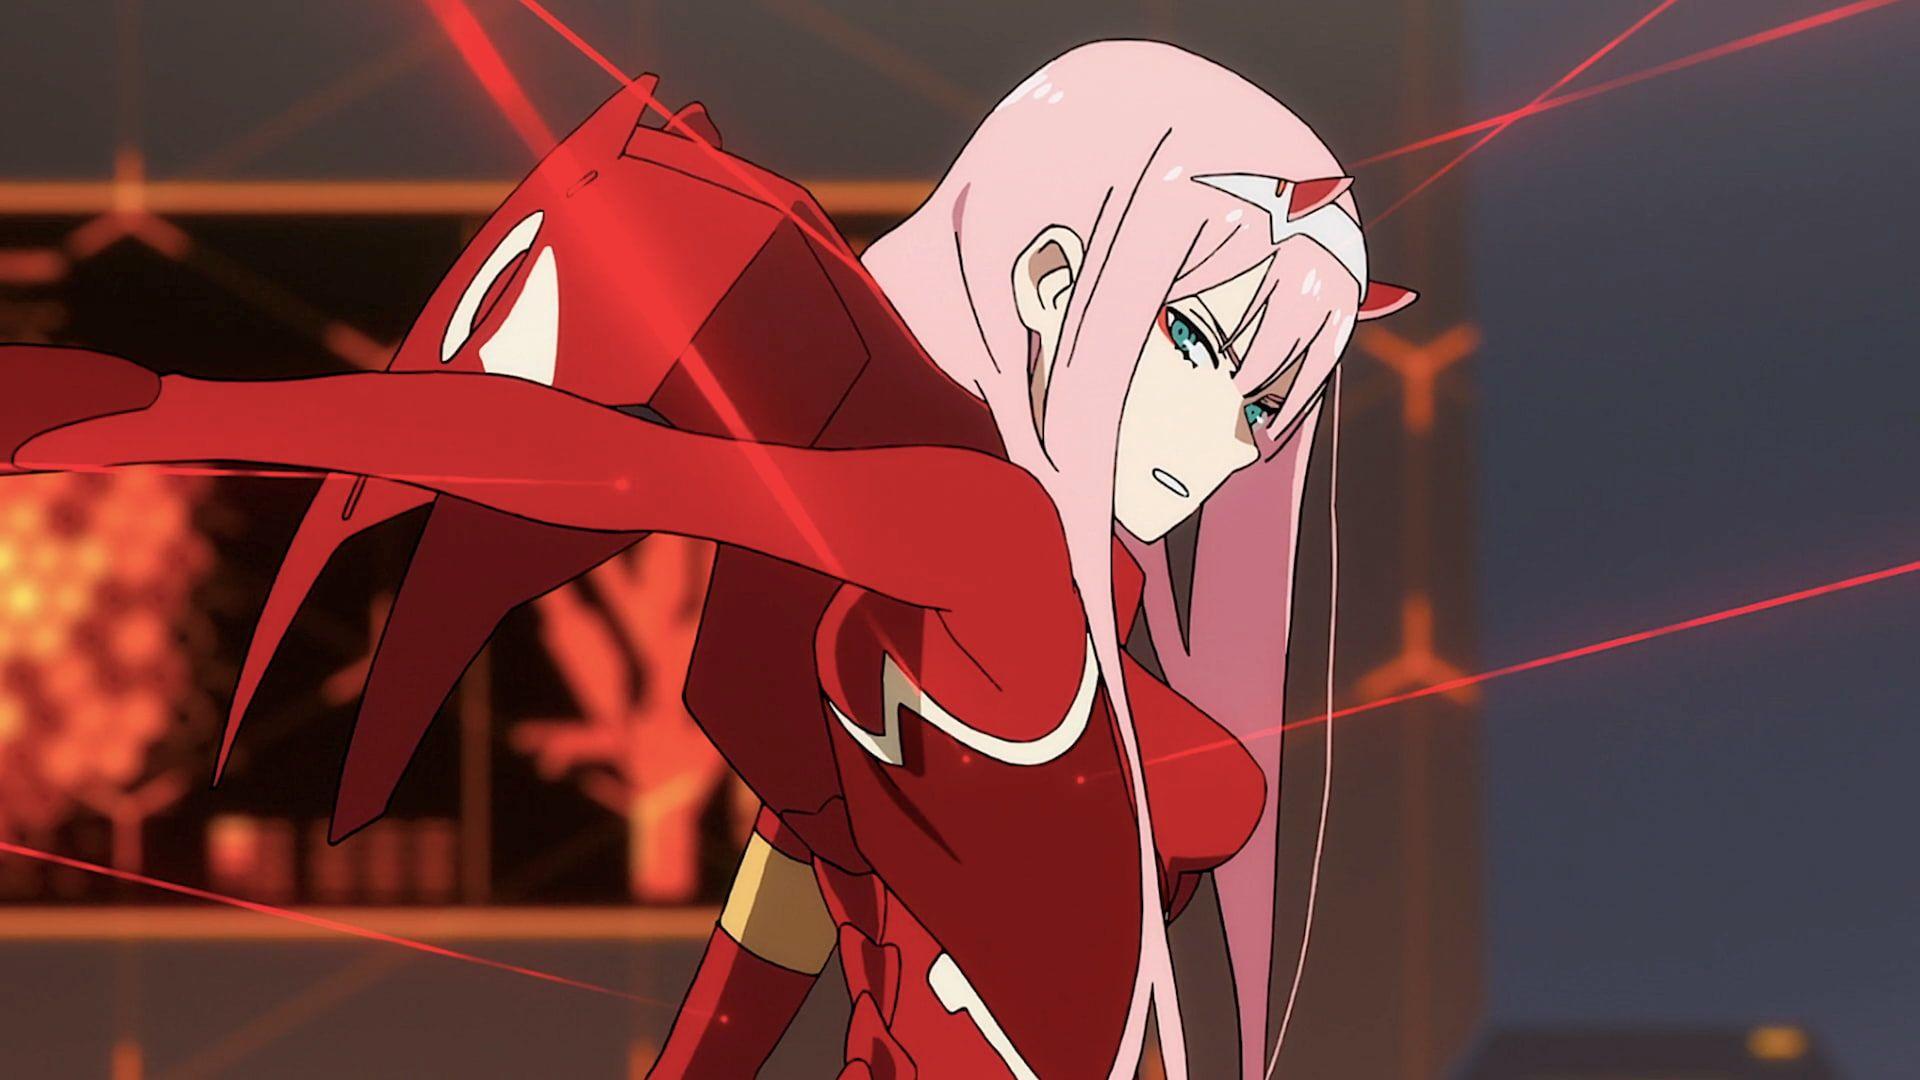 Digital Art Artwork Pink Hair Green Eyes Darling In The Franxx Zero Two Darling In The Franxx Code 002 02 Darling In The Franxx Zero Two Best Anime Shows